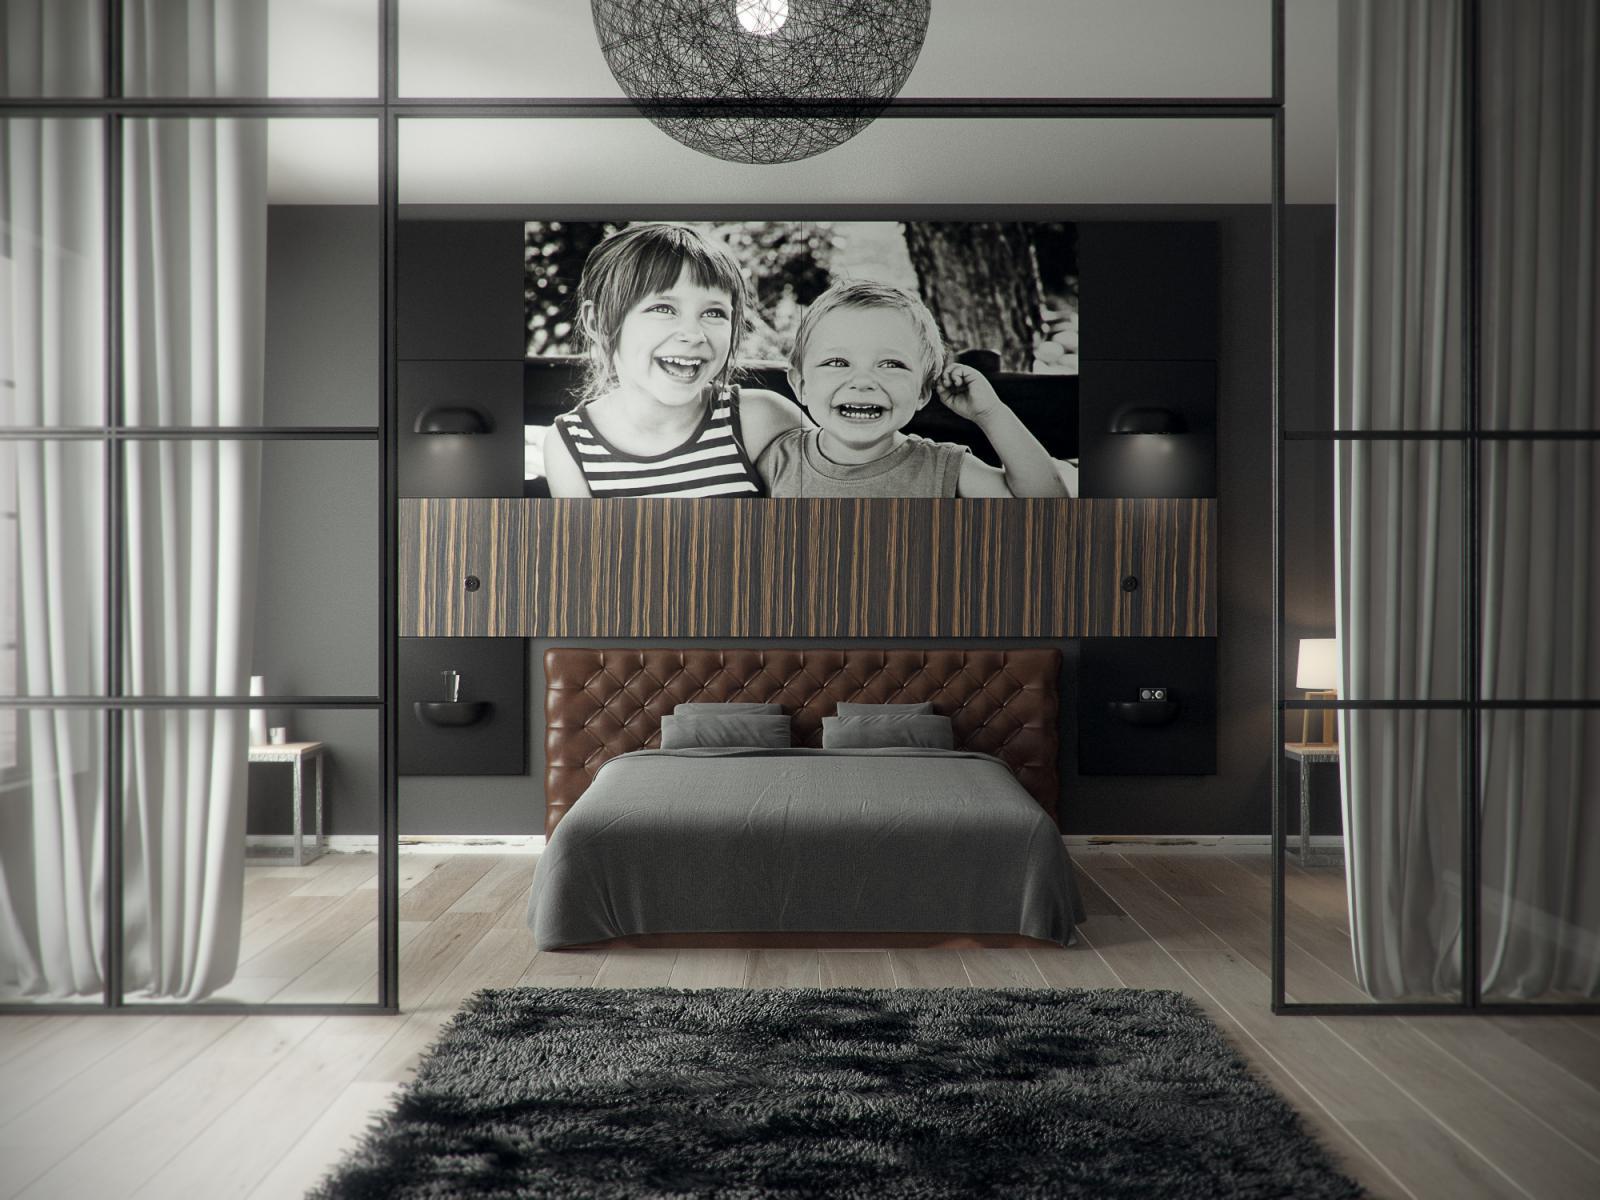 Slaapkamer Hotelsfeer. Photos Of The Modern Huis Taupe Muur ...